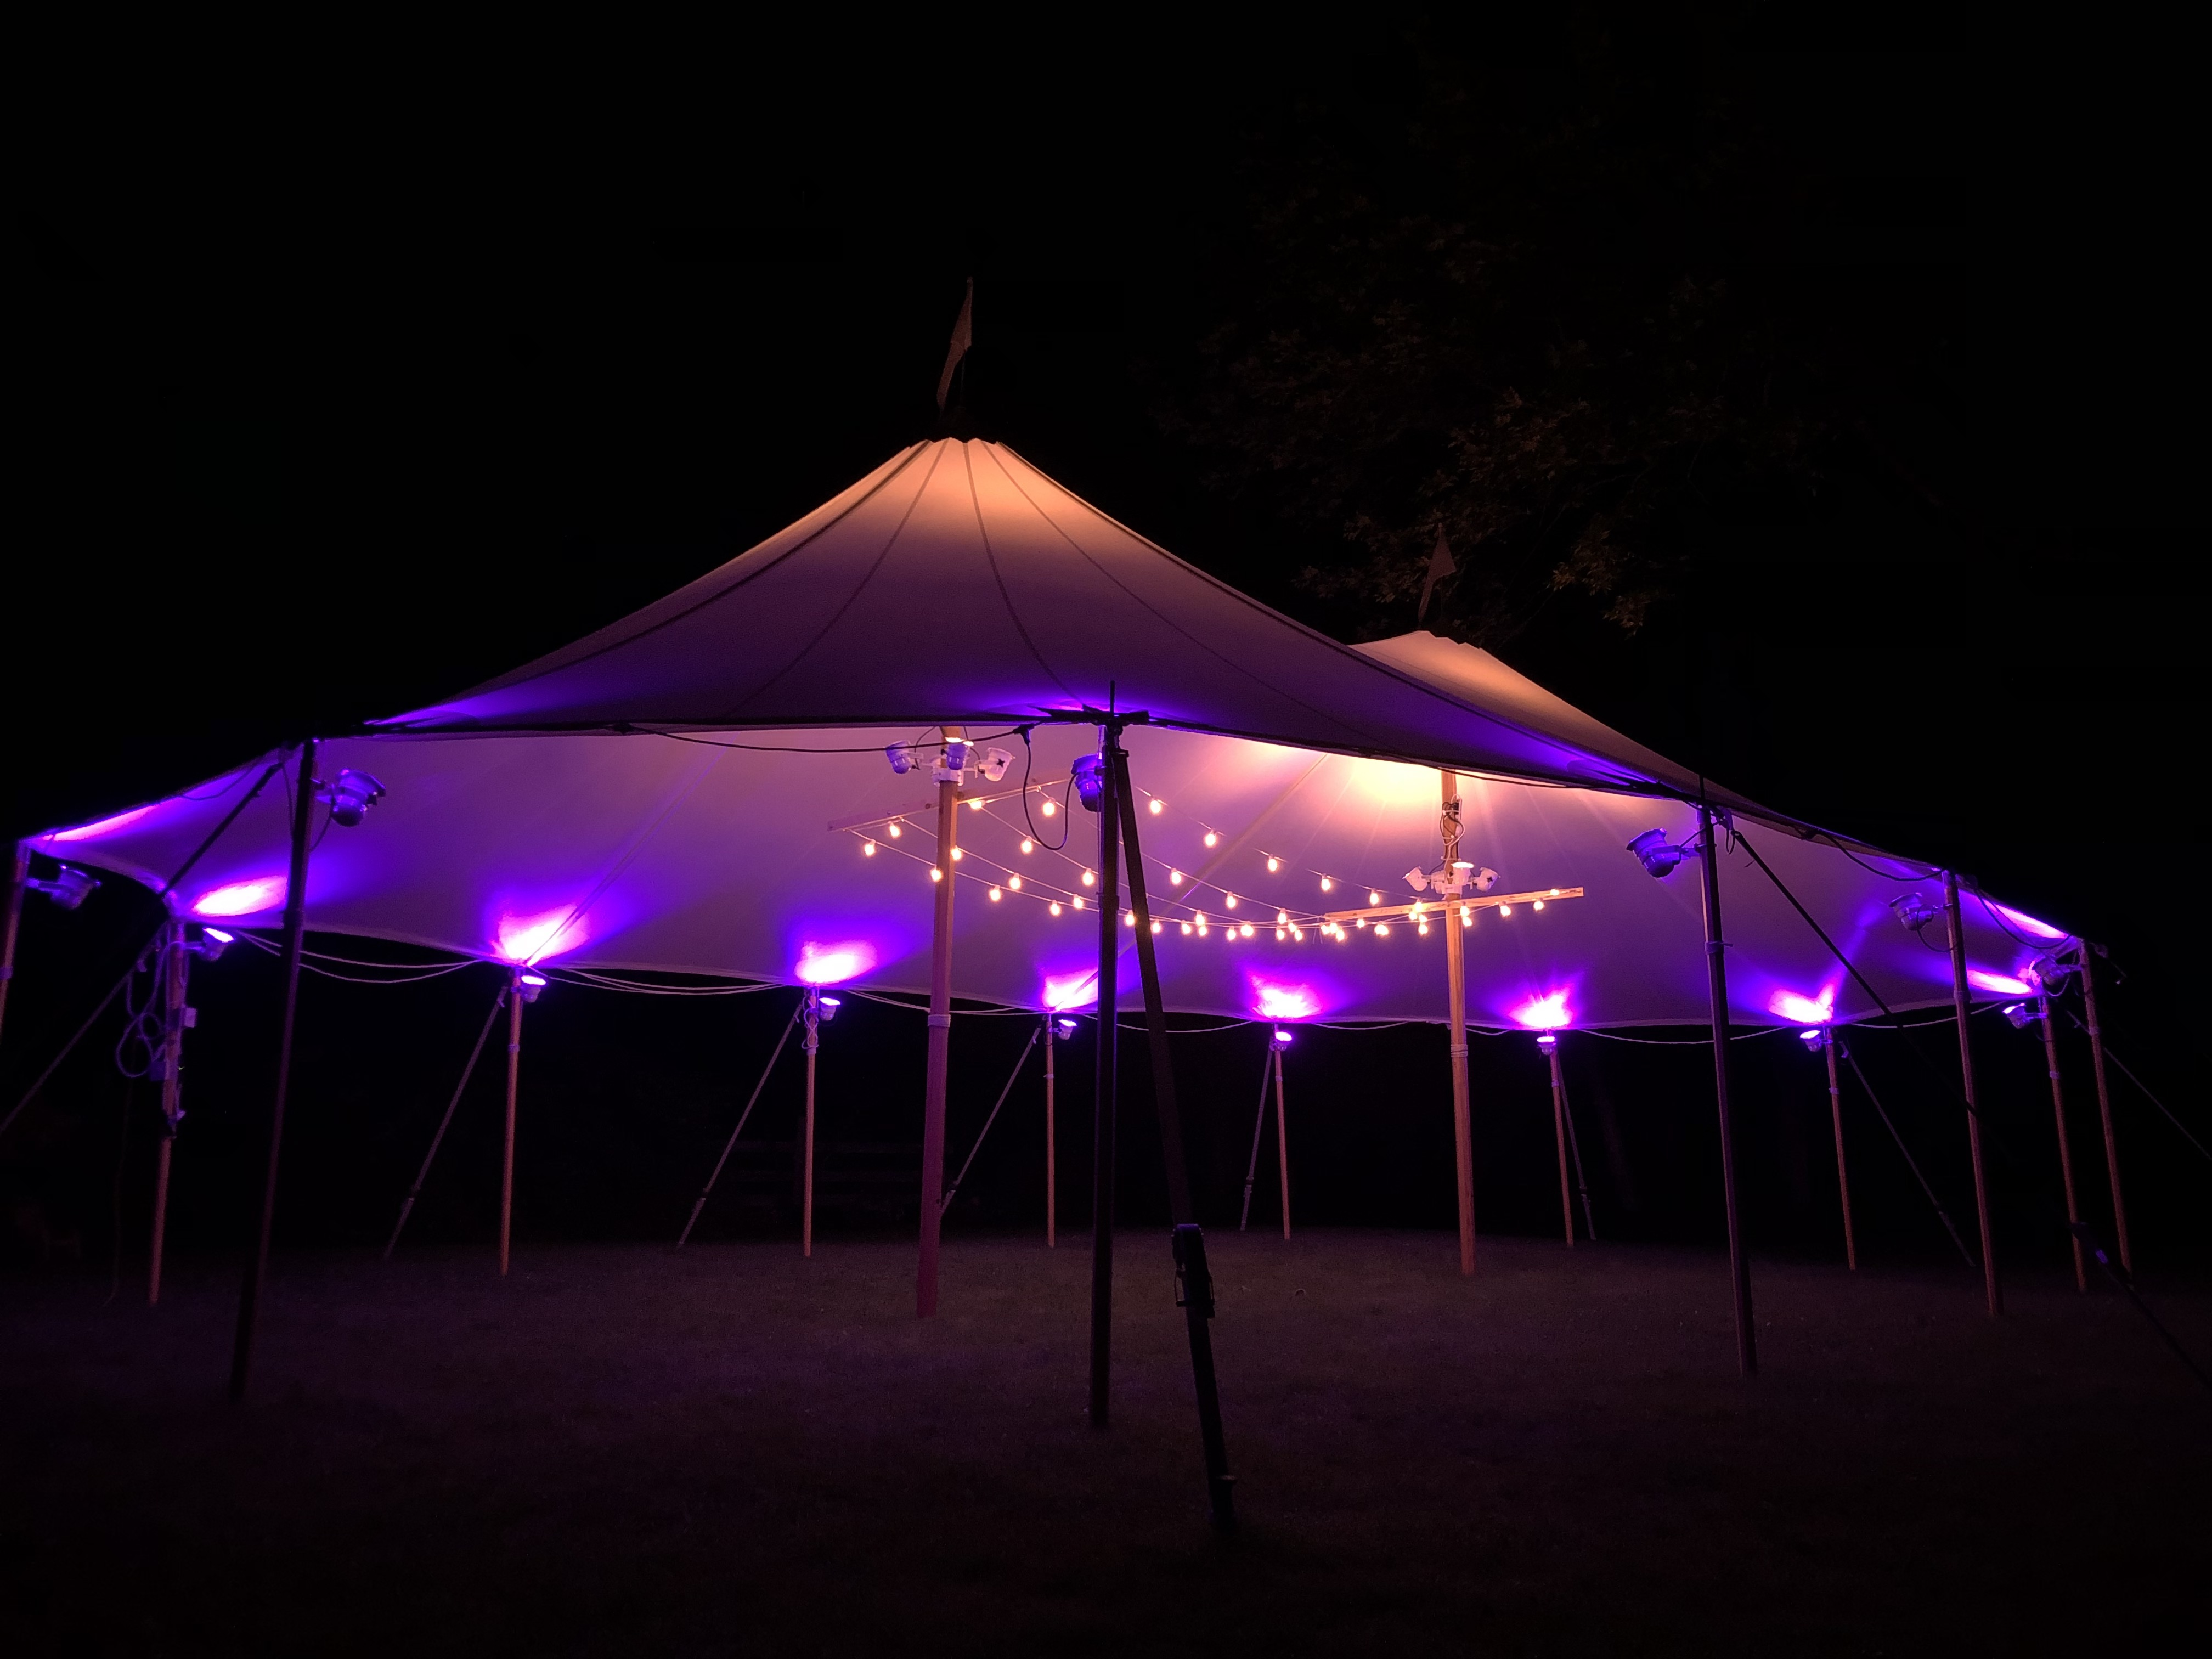 32x50 Tidewater Sailcloth Tent Purple an